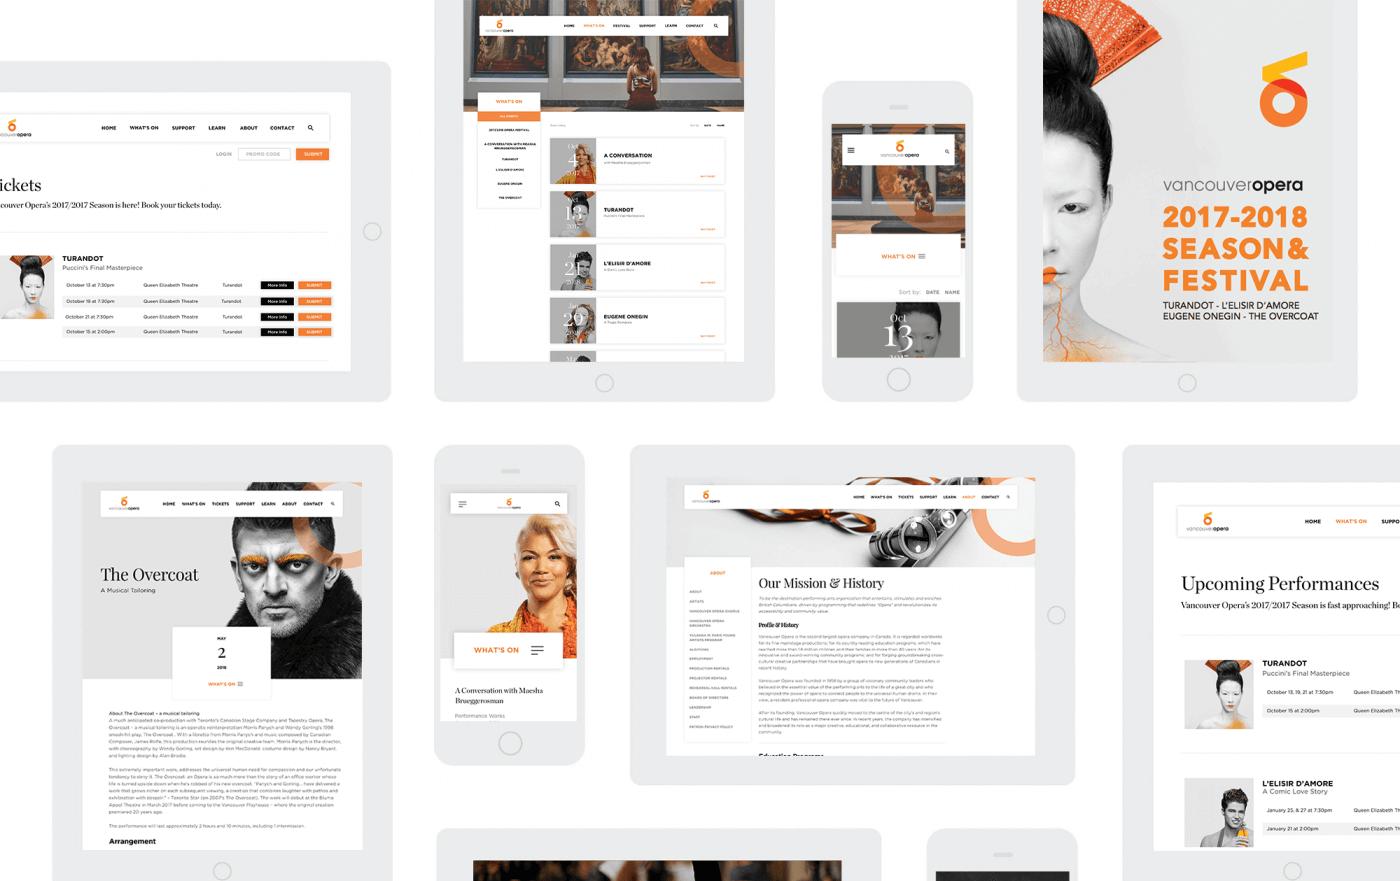 Website design mockups for the Vancouver Opera